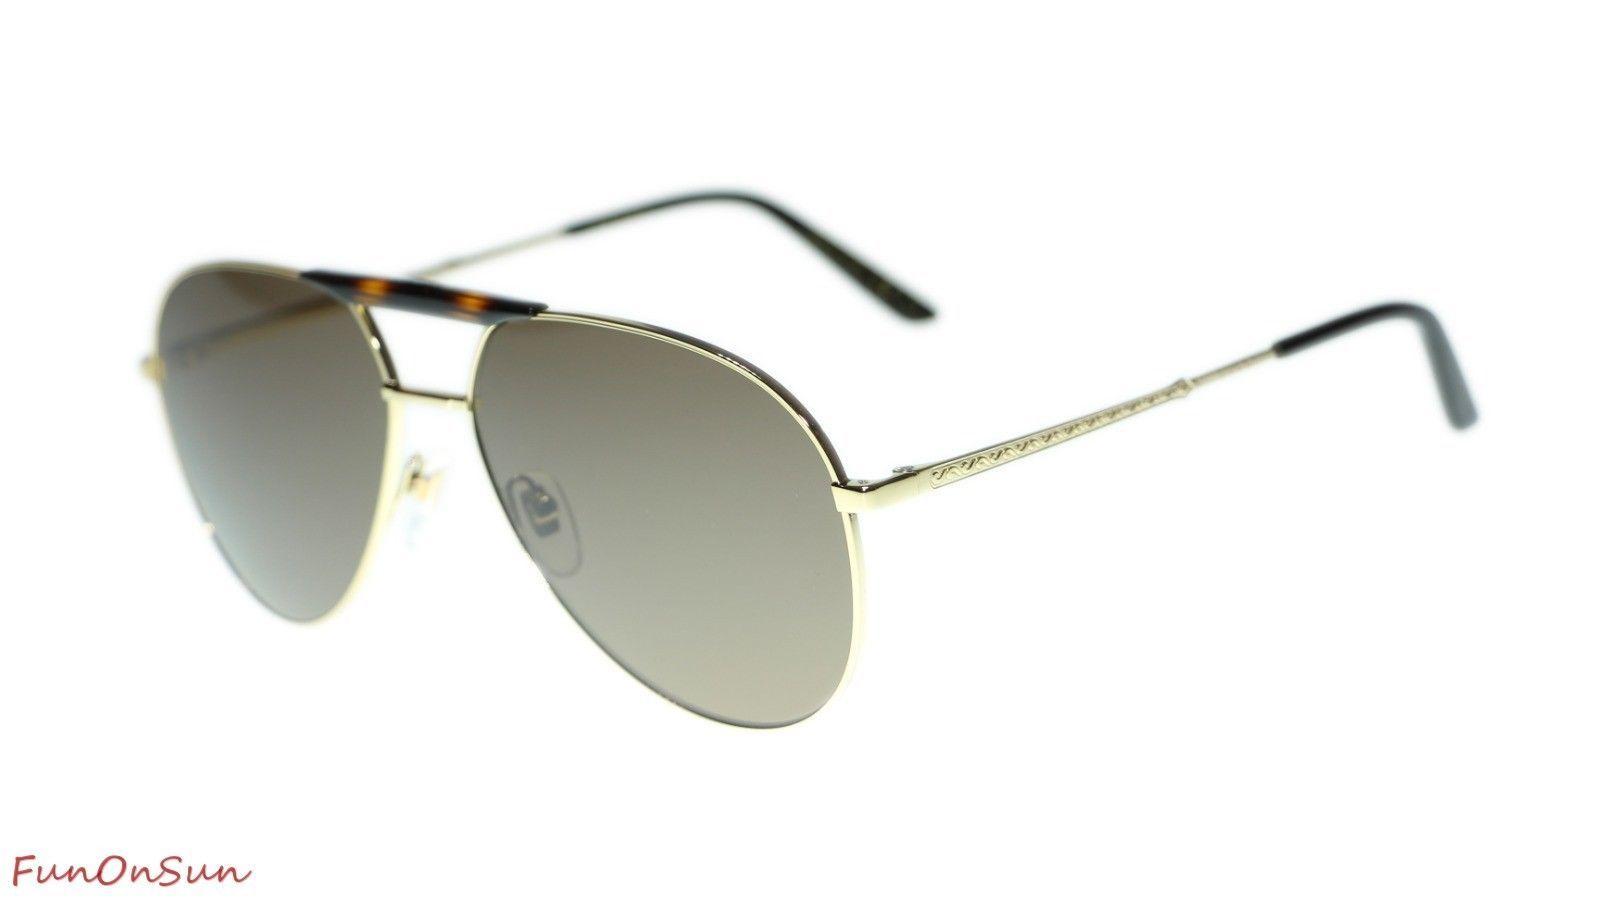 91866d6cf10e7 10. 10. Previous. Gucci Men Sunglasses GG0242S 002 Gold Brown Lens Aviator  59mm Authentic. Gucci ...